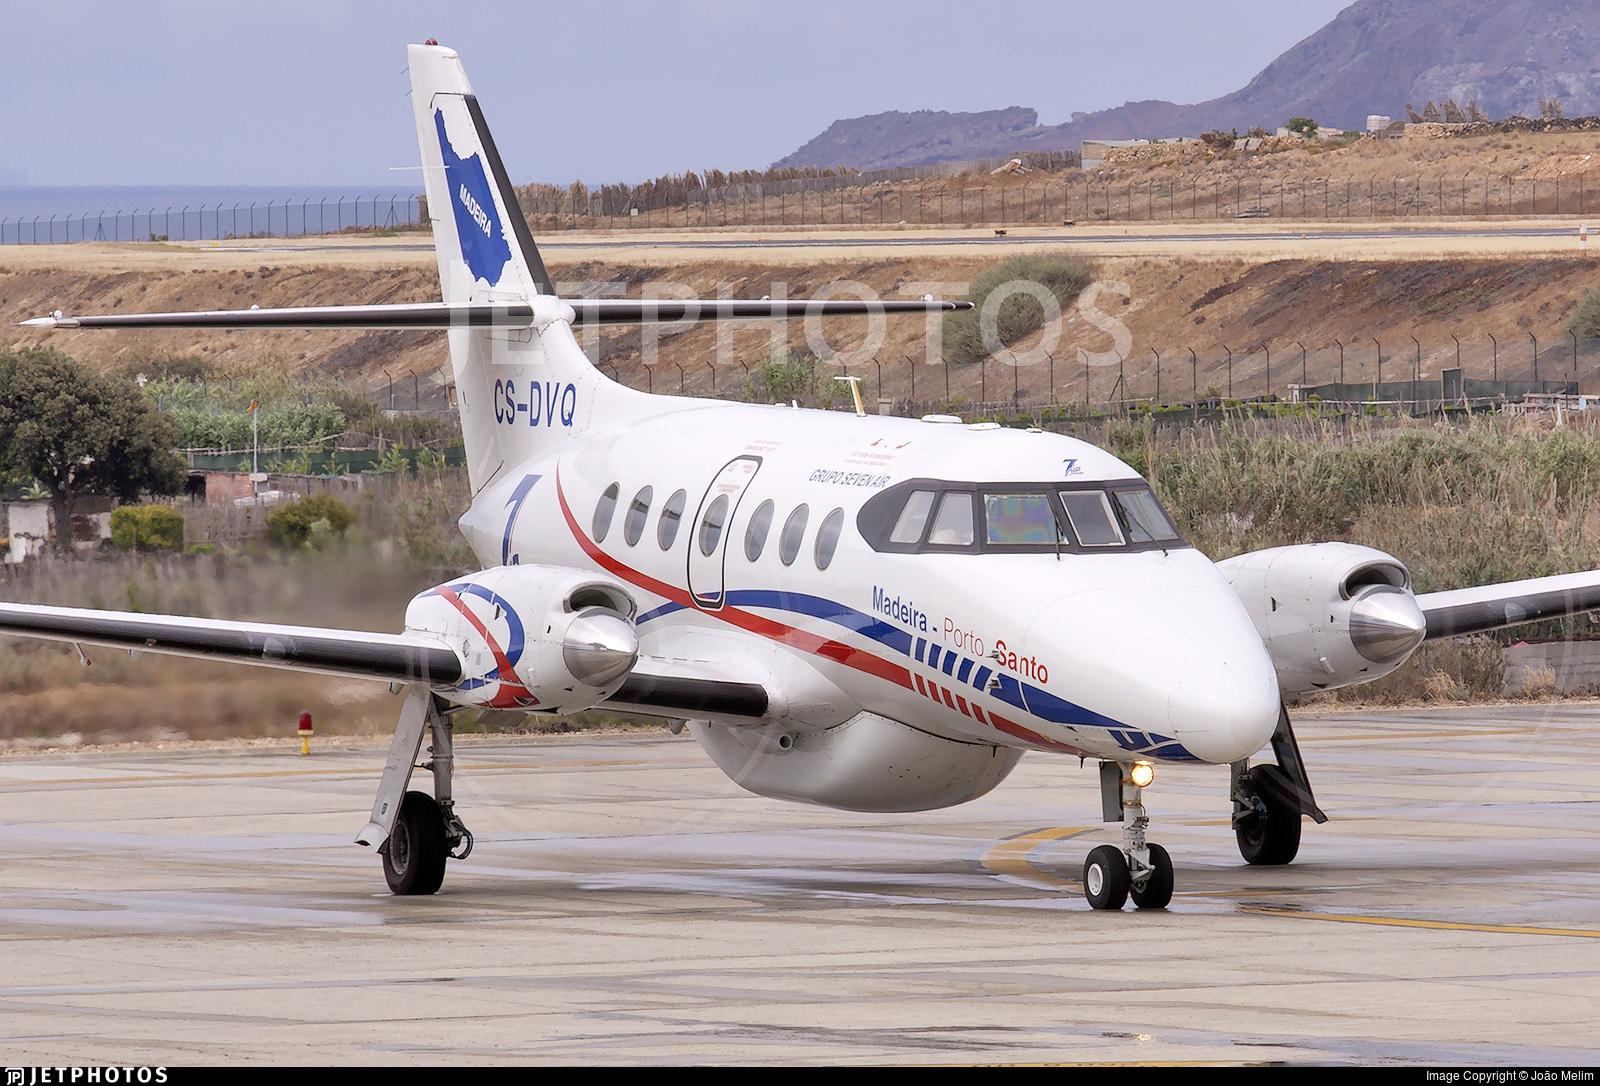 CS-DVQ - British Aerospace Jetstream 32 - AeroVIP